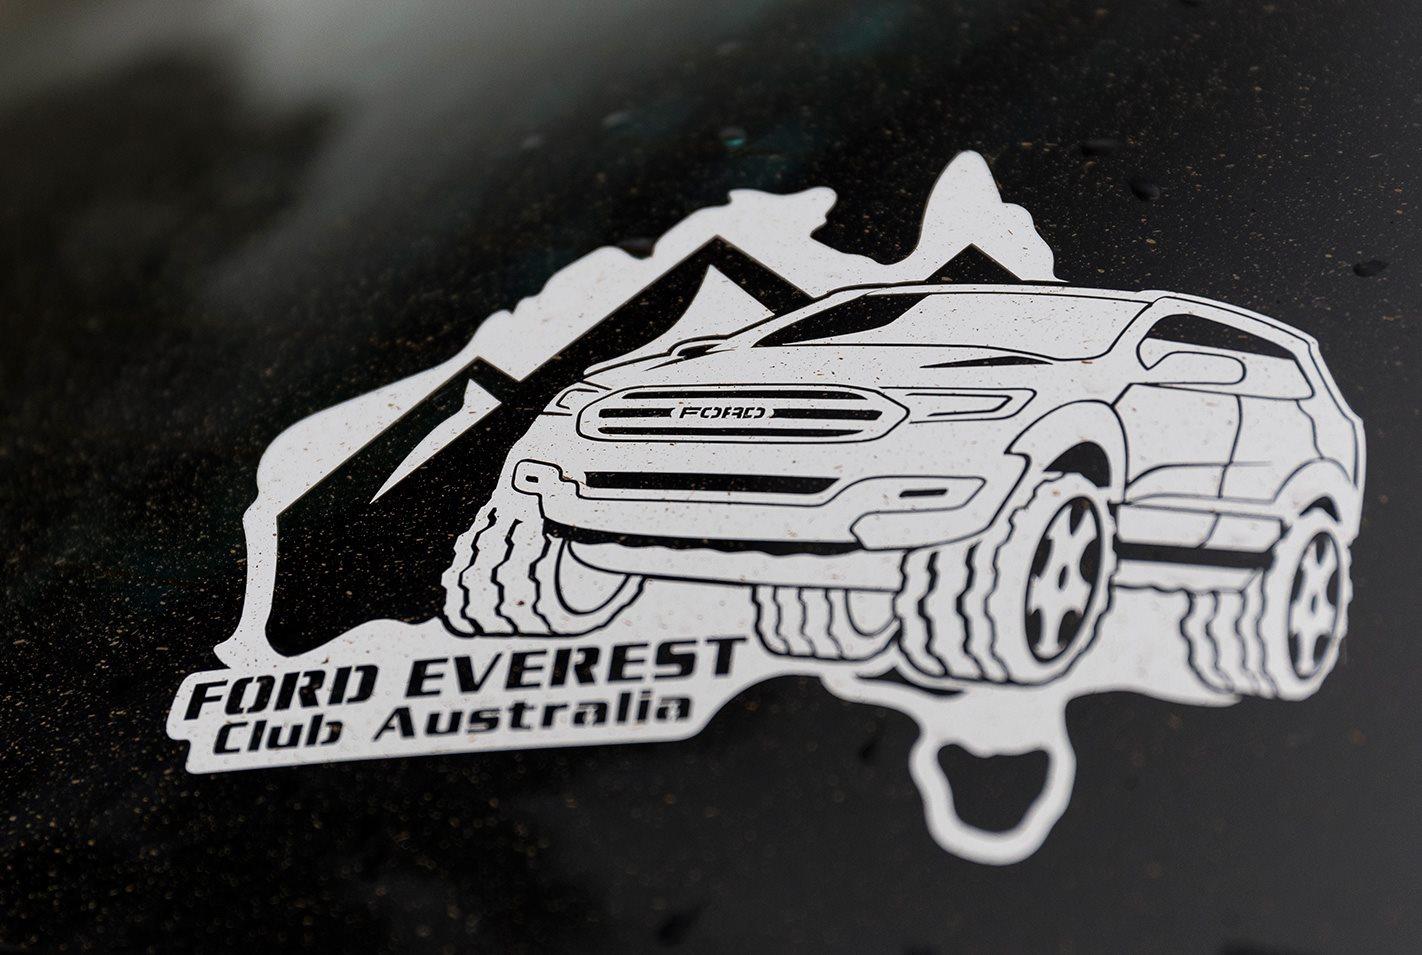 Ford Everest club Australia sticker.jpg